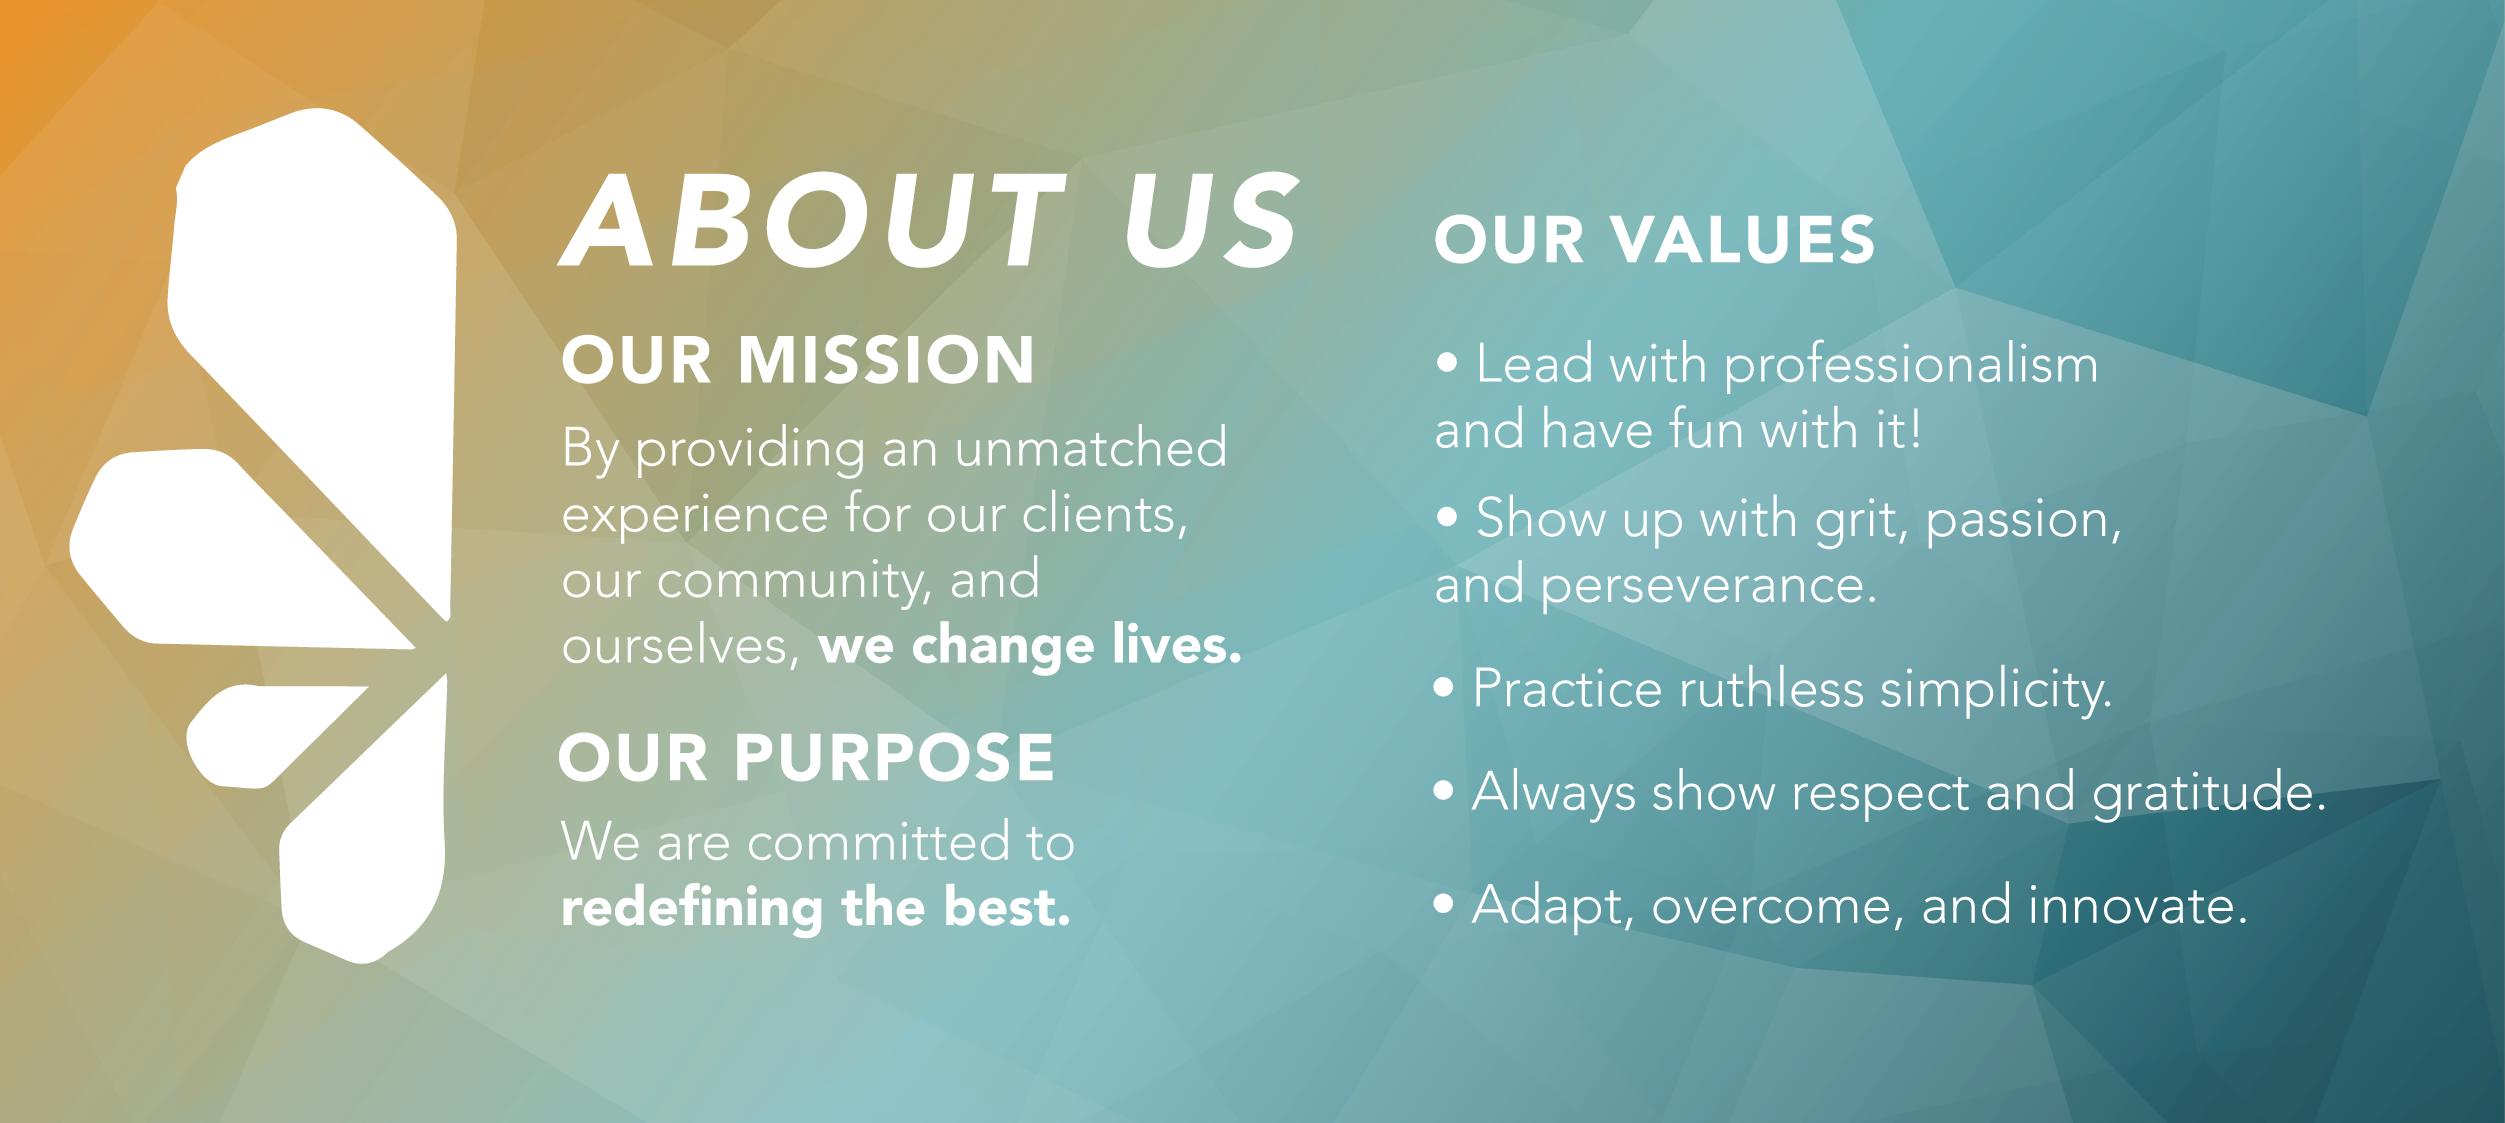 Avea About-Mission-Purpose-Values graphic 2018-10-15-05